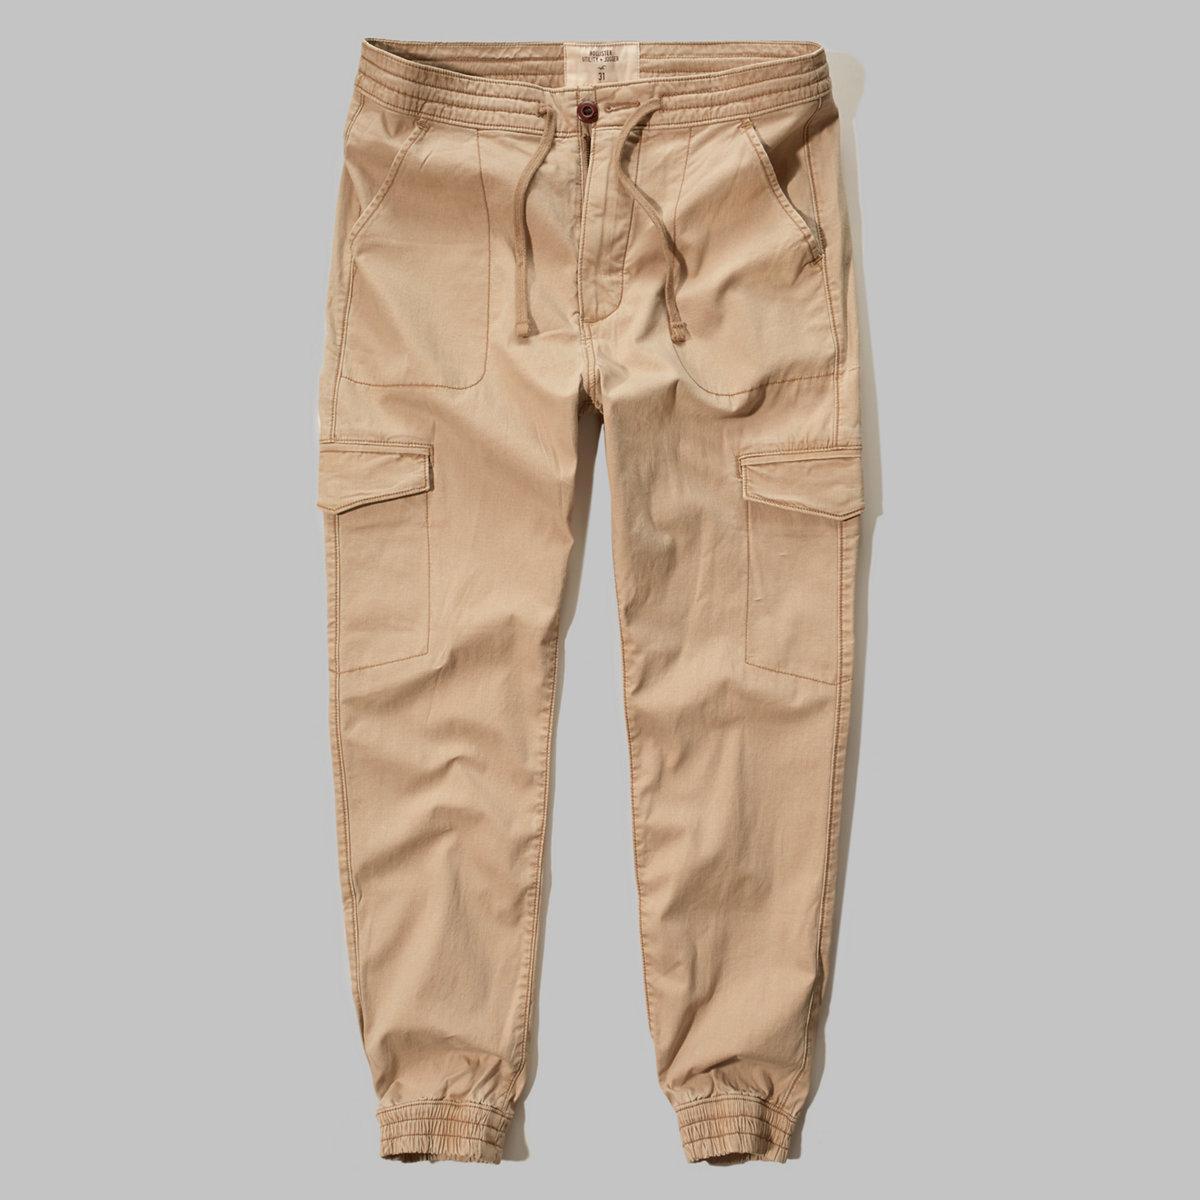 Hollister Utility Jogger Pants